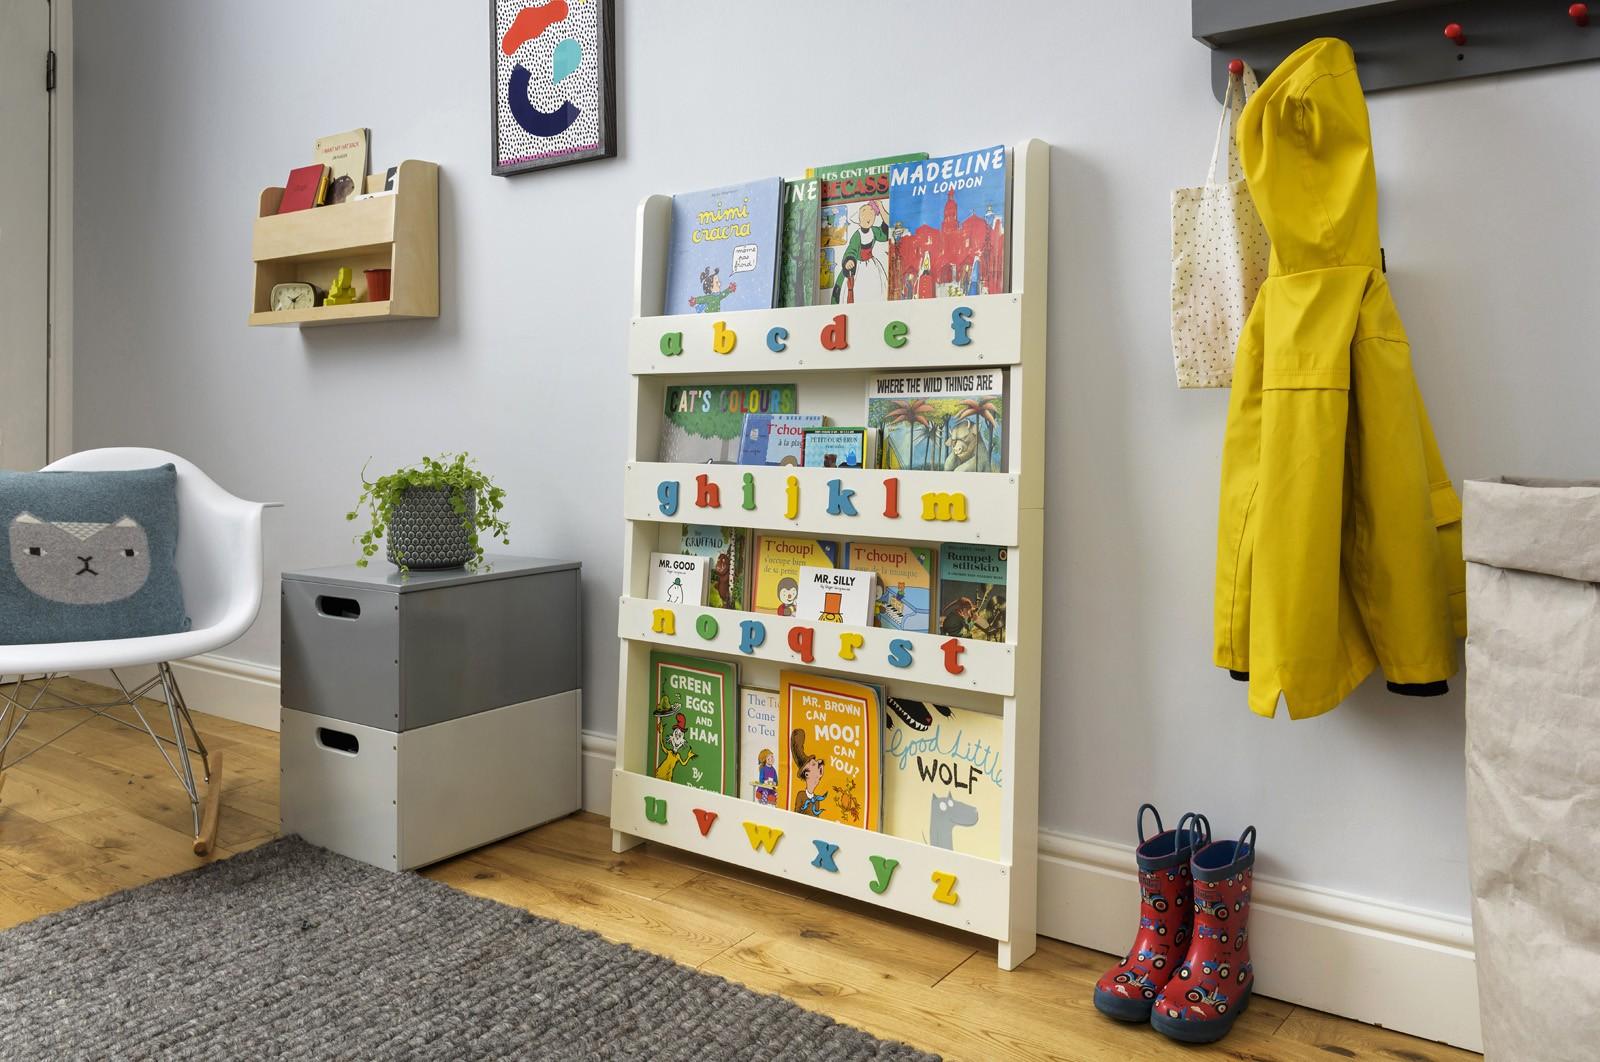 Full Size of Bücherregal Kinderzimmer Tidy Books Bcherregale Originales Preisgekrntes Sortiment Regal Weiß Regale Sofa Kinderzimmer Bücherregal Kinderzimmer